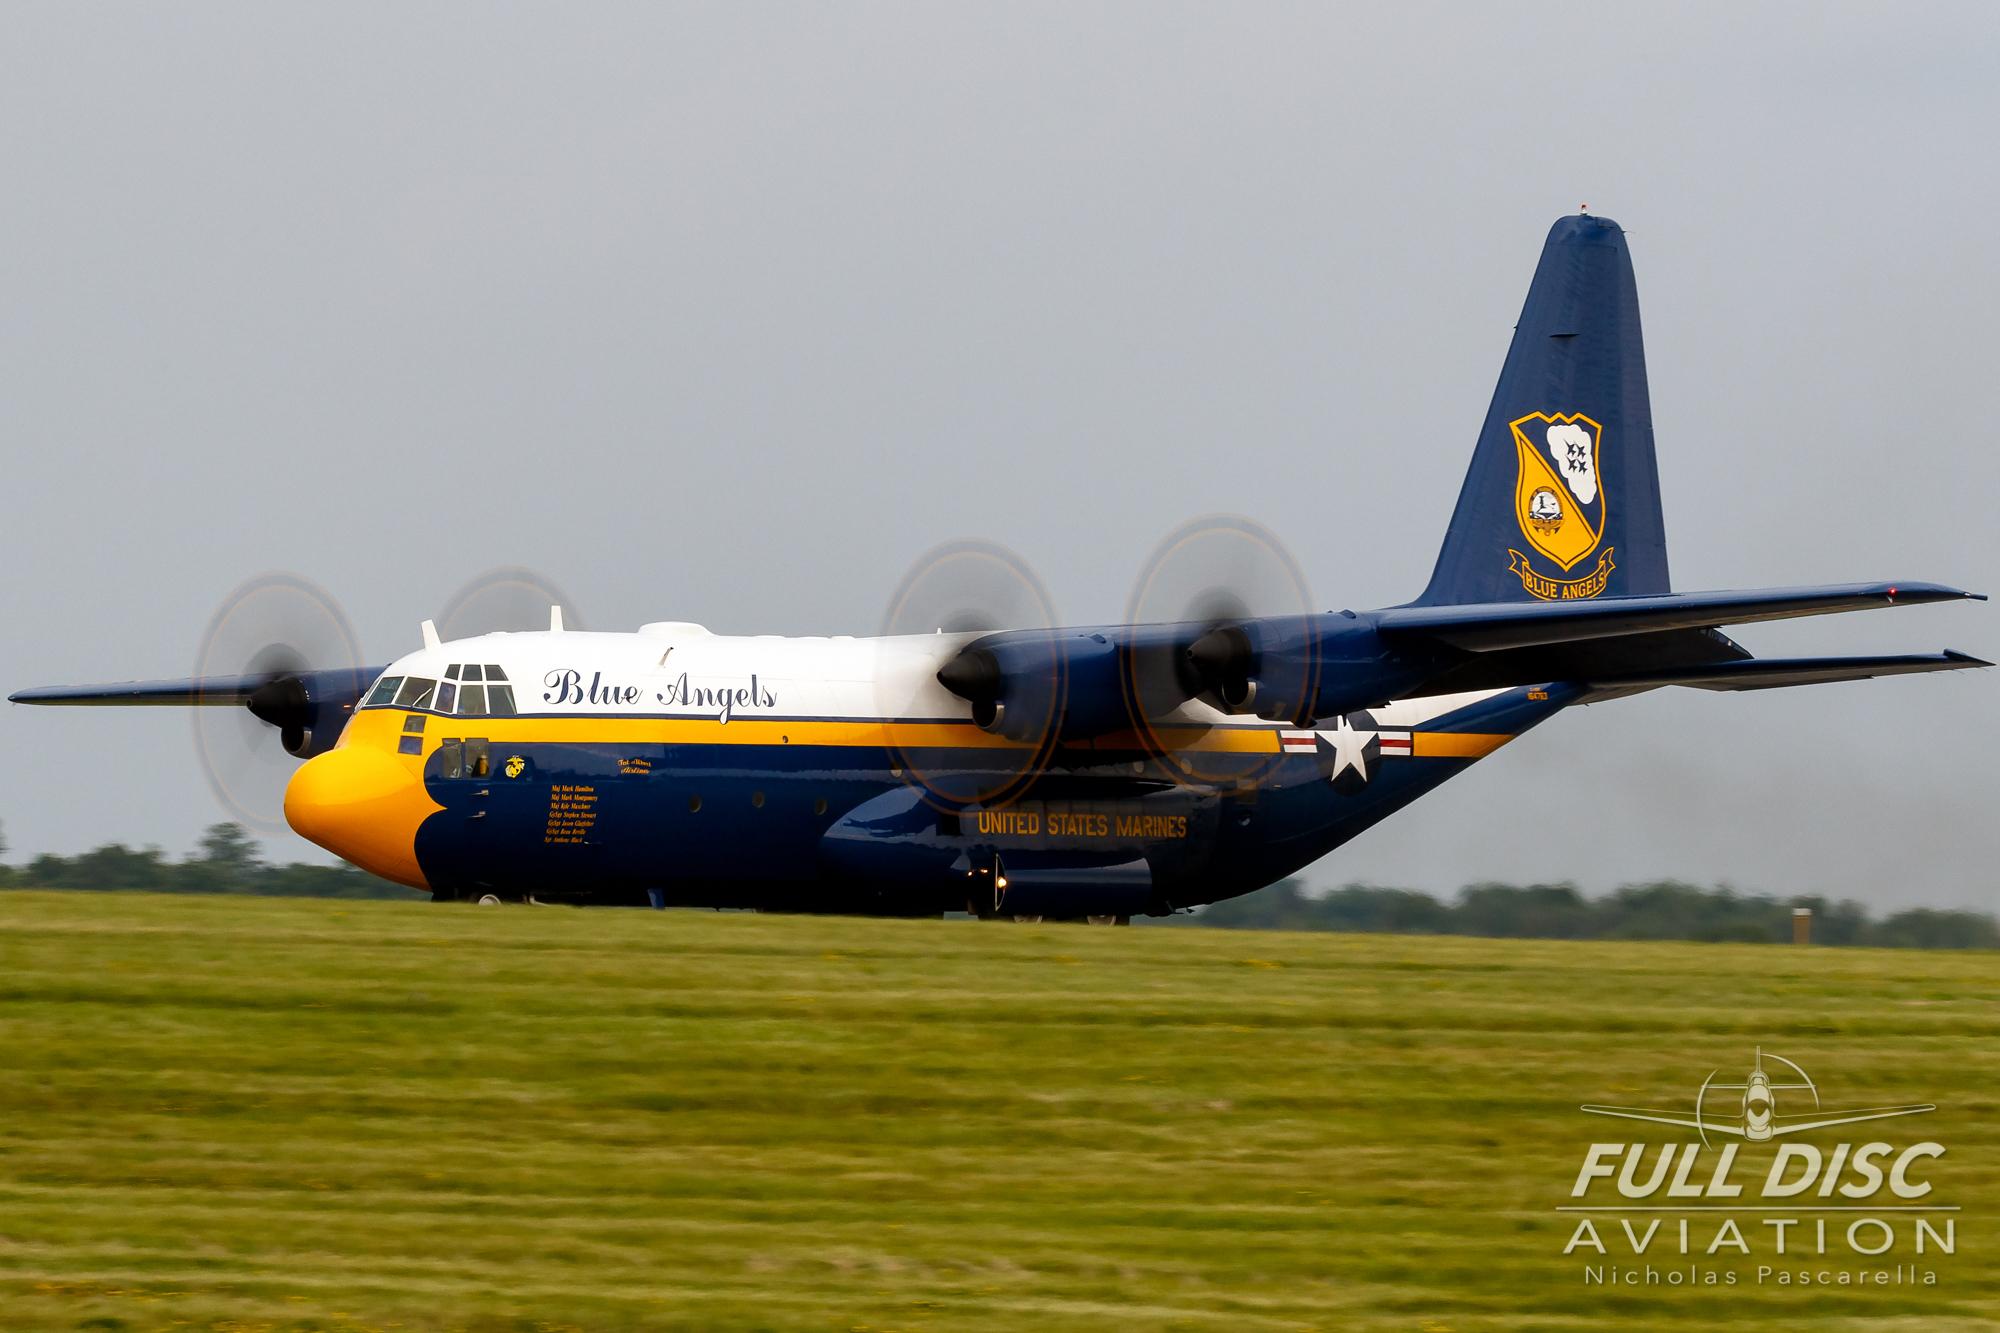 nickpascarella_nicholaspascarella_fulldiscaviation_aircraft_fatalbert_blueangels.jpg